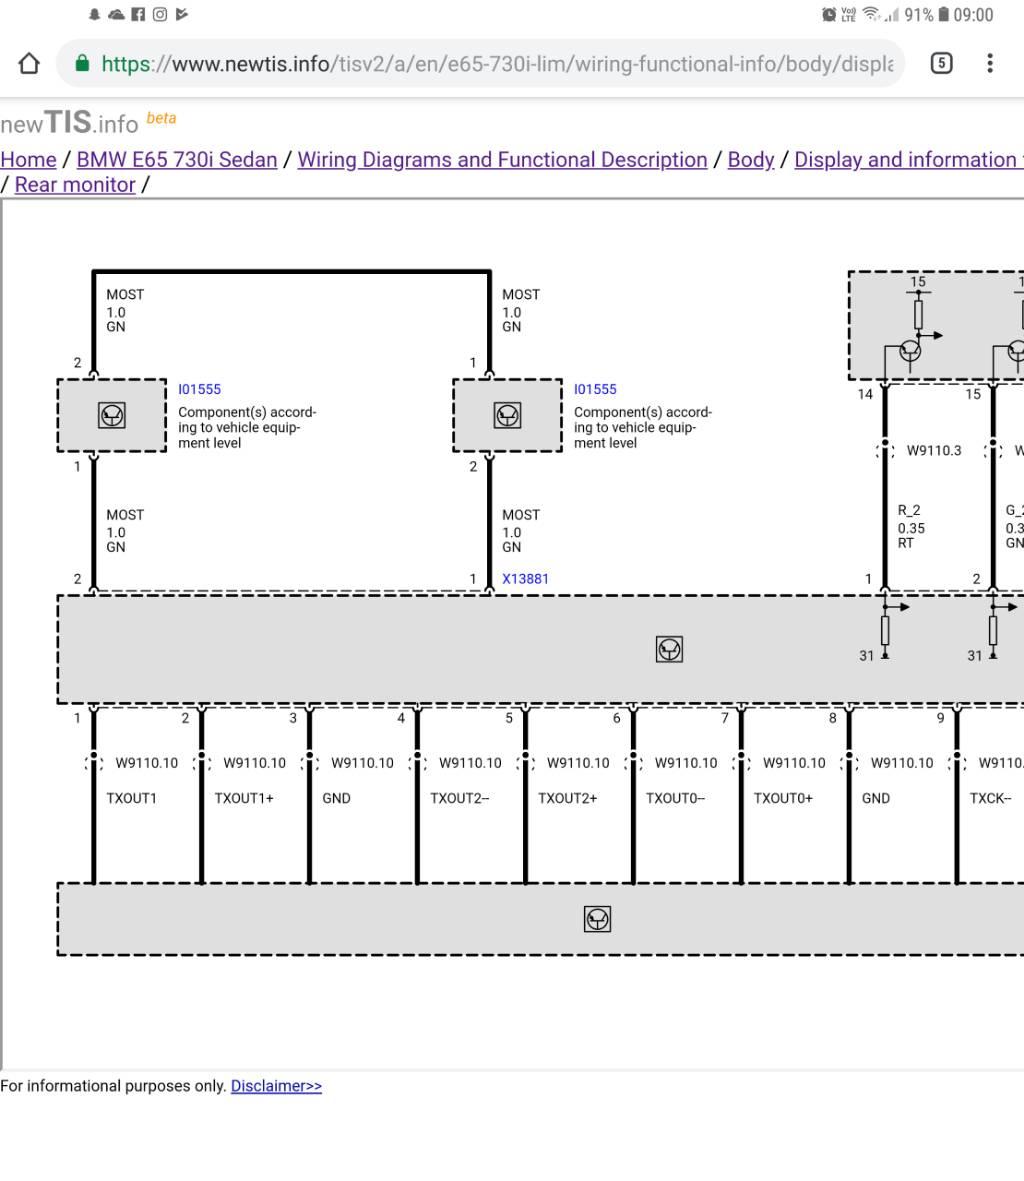 Click image for larger version  Name:Screenshot_20181123-090002_Chrome.jpeg Views:89 Size:84.4 KB ID:829251